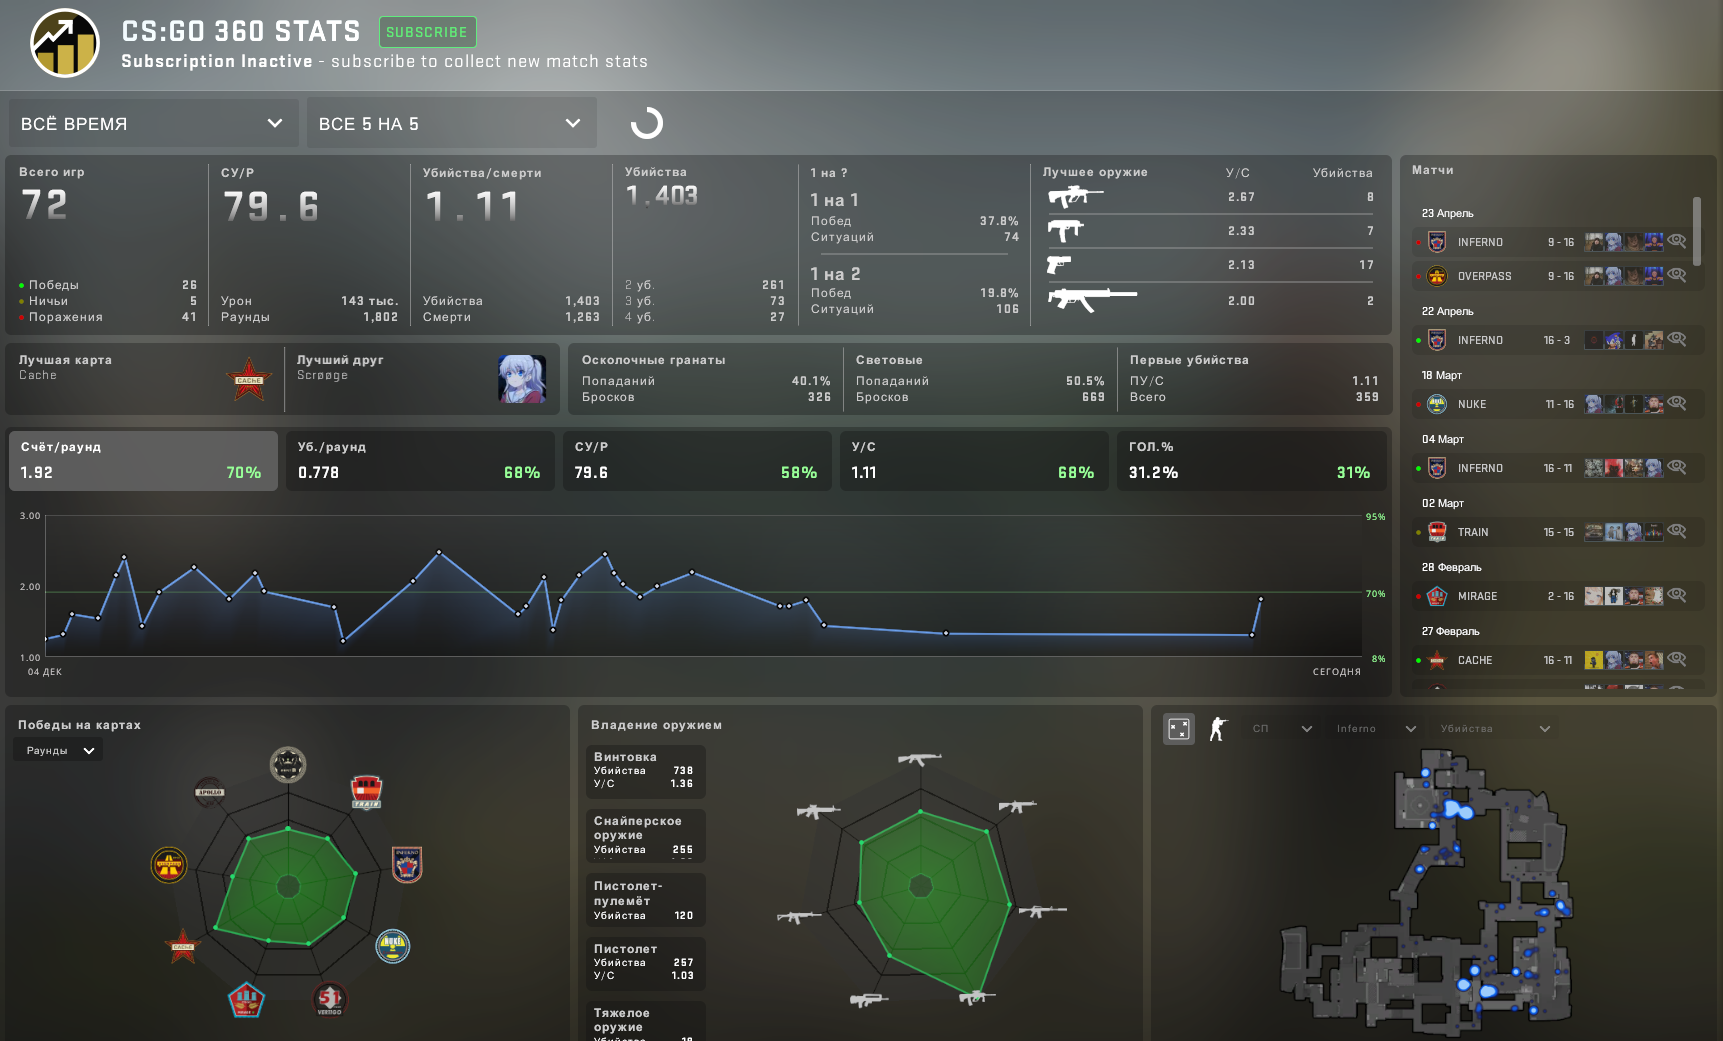 Valve добавила в CS:GO платную статистику за 1 доллар в месяц